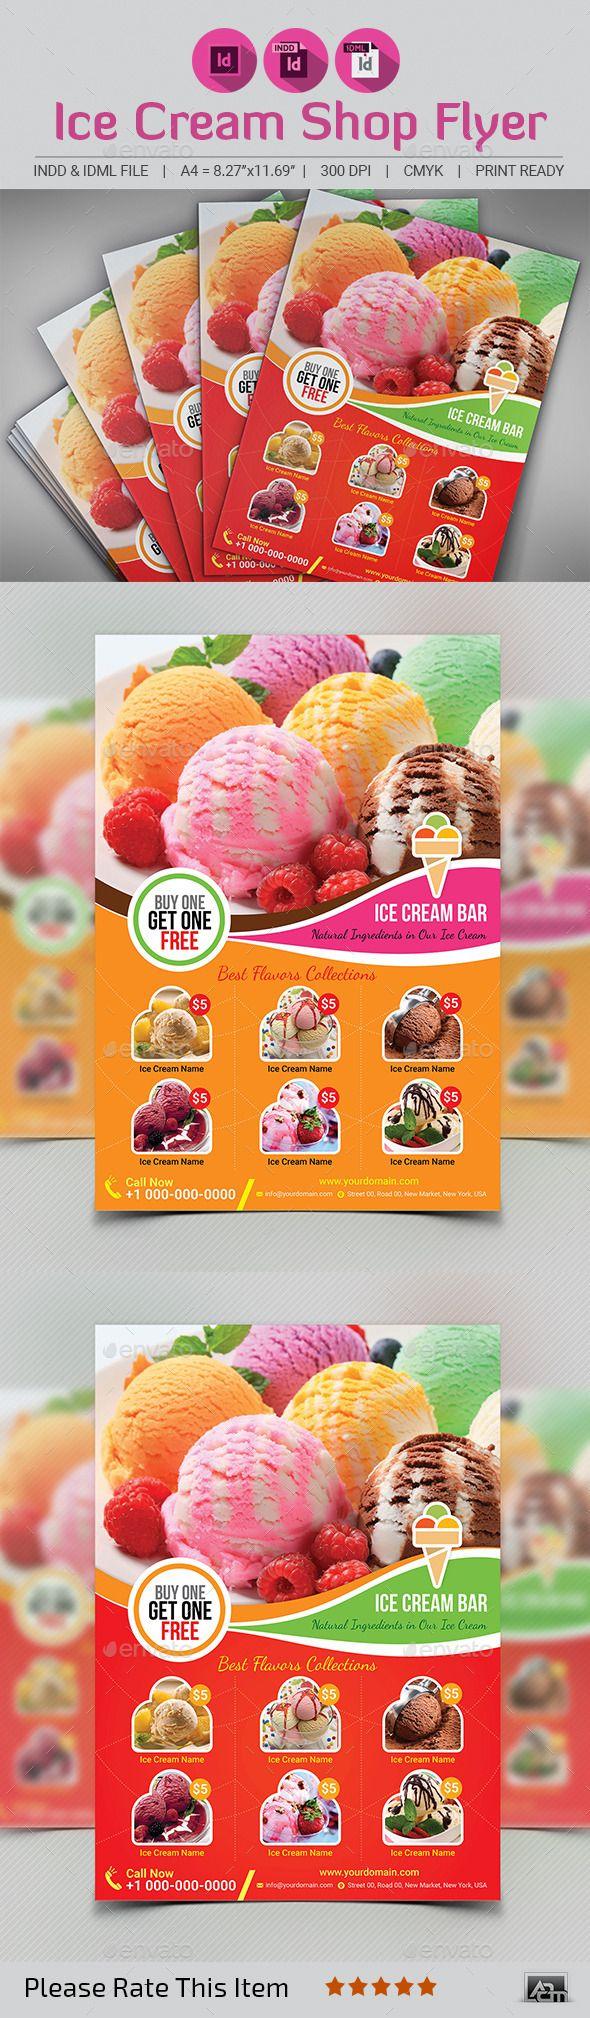 ice cream shop flyer template shops flyer template and restaurant ice cream shop flyer template restaurant flyers